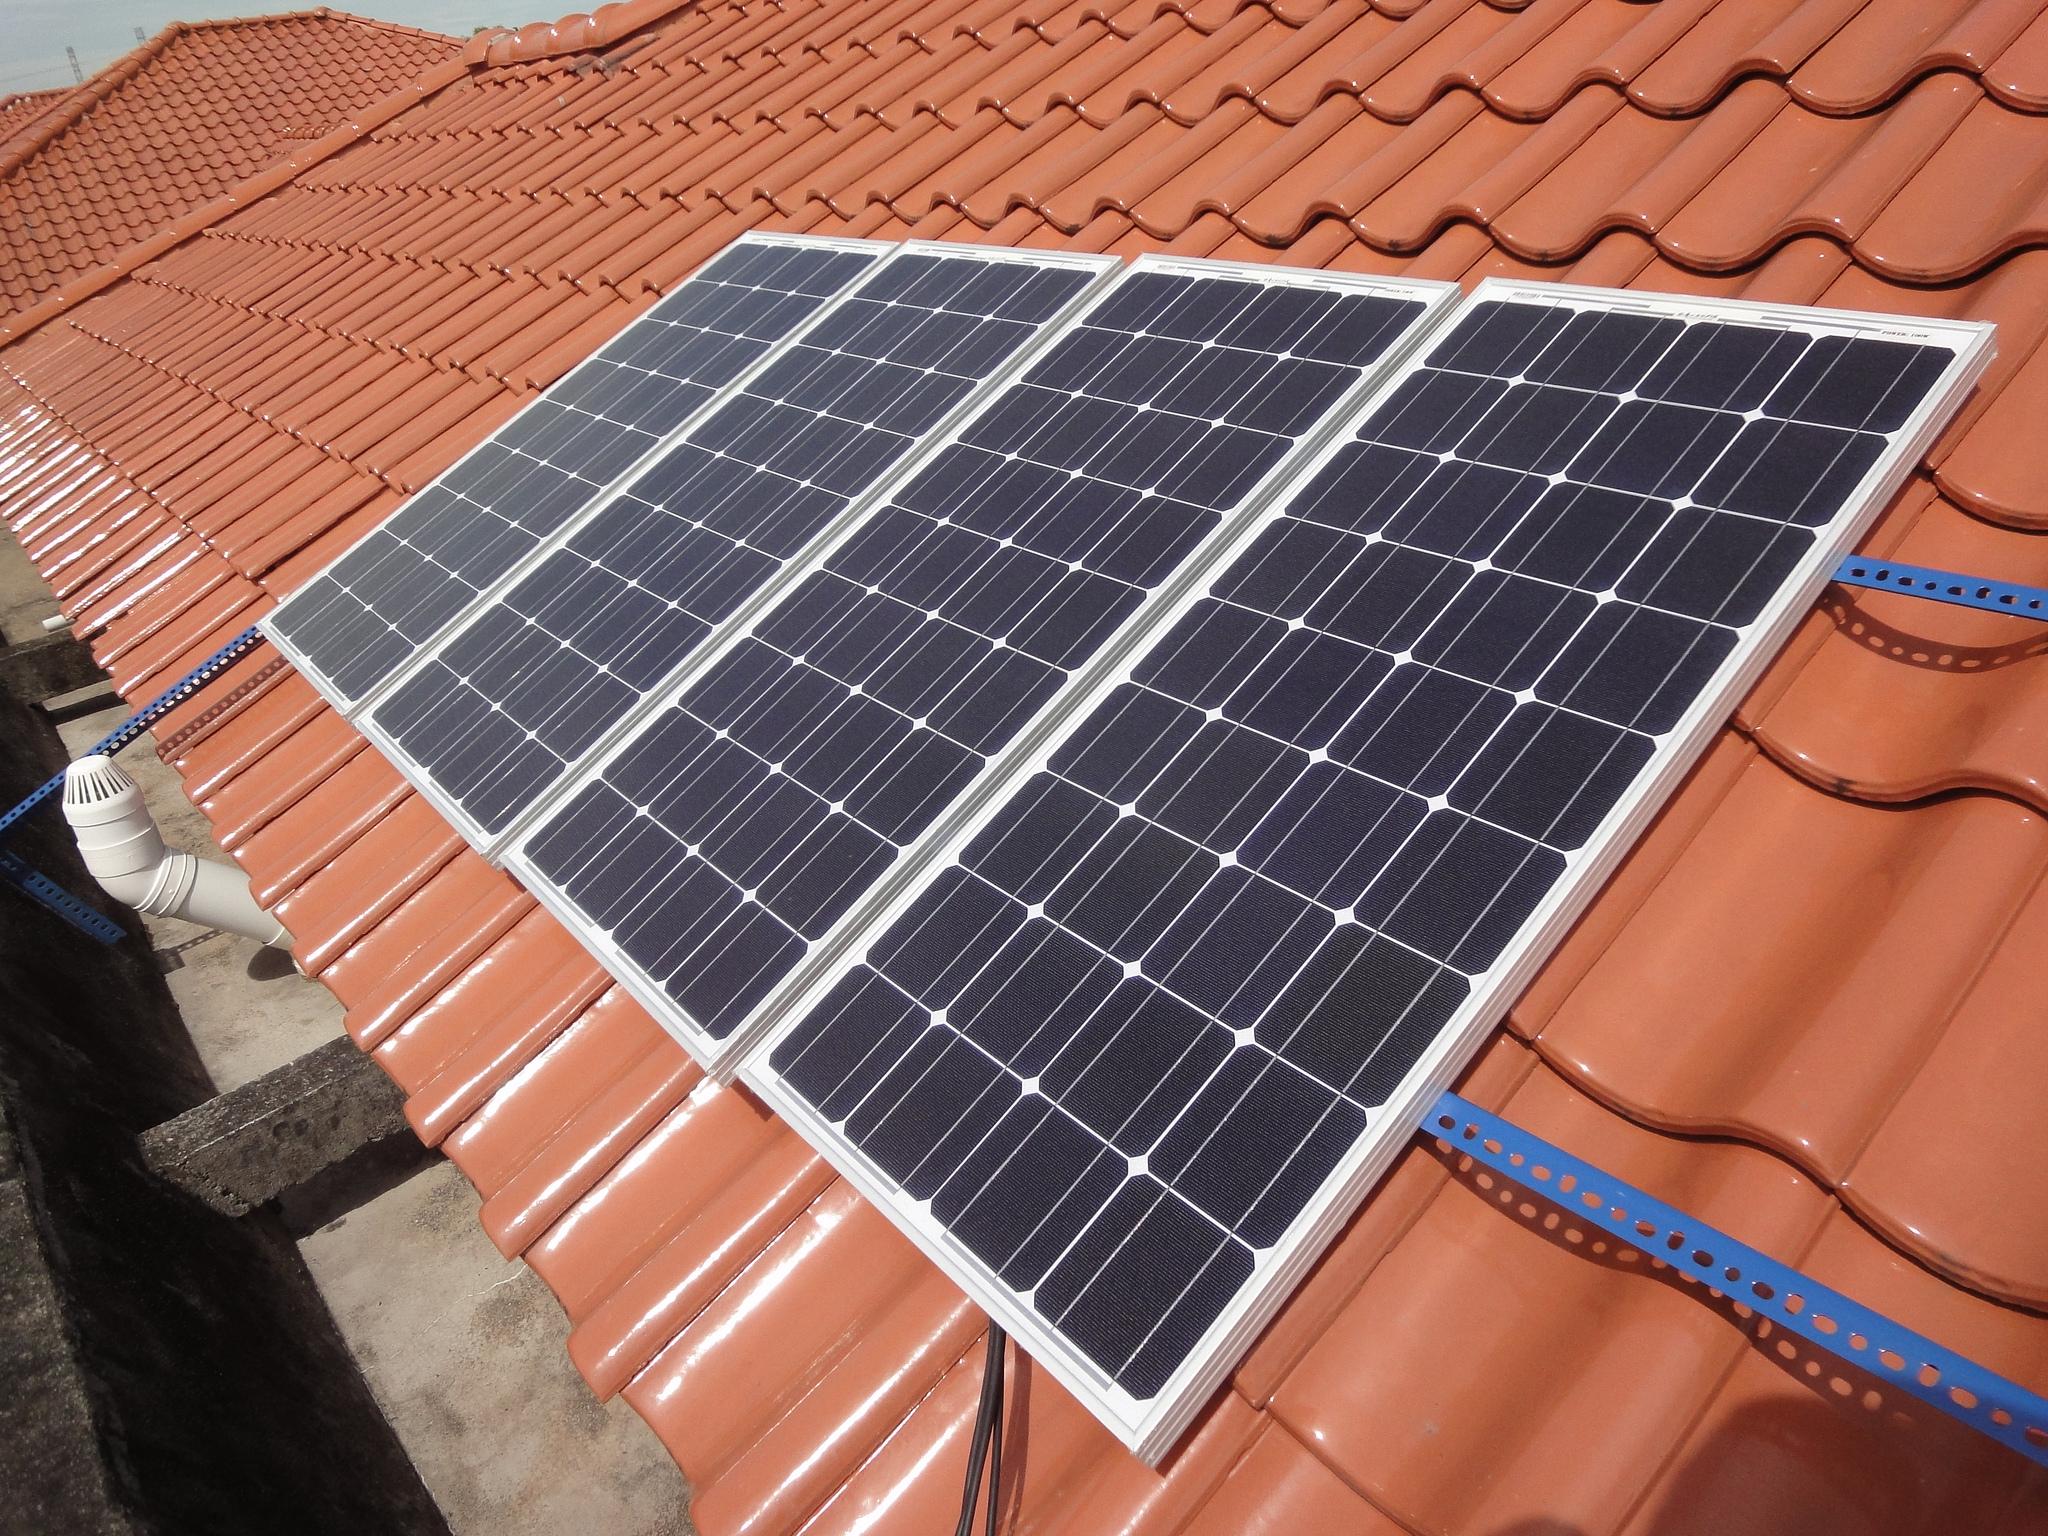 flickr.com; Marufish Solar Panel/ https://flic.kr/p/dH6FW3; Veröffentlicht unter: https://creativecommons.org/licenses/by-sa/2.0/